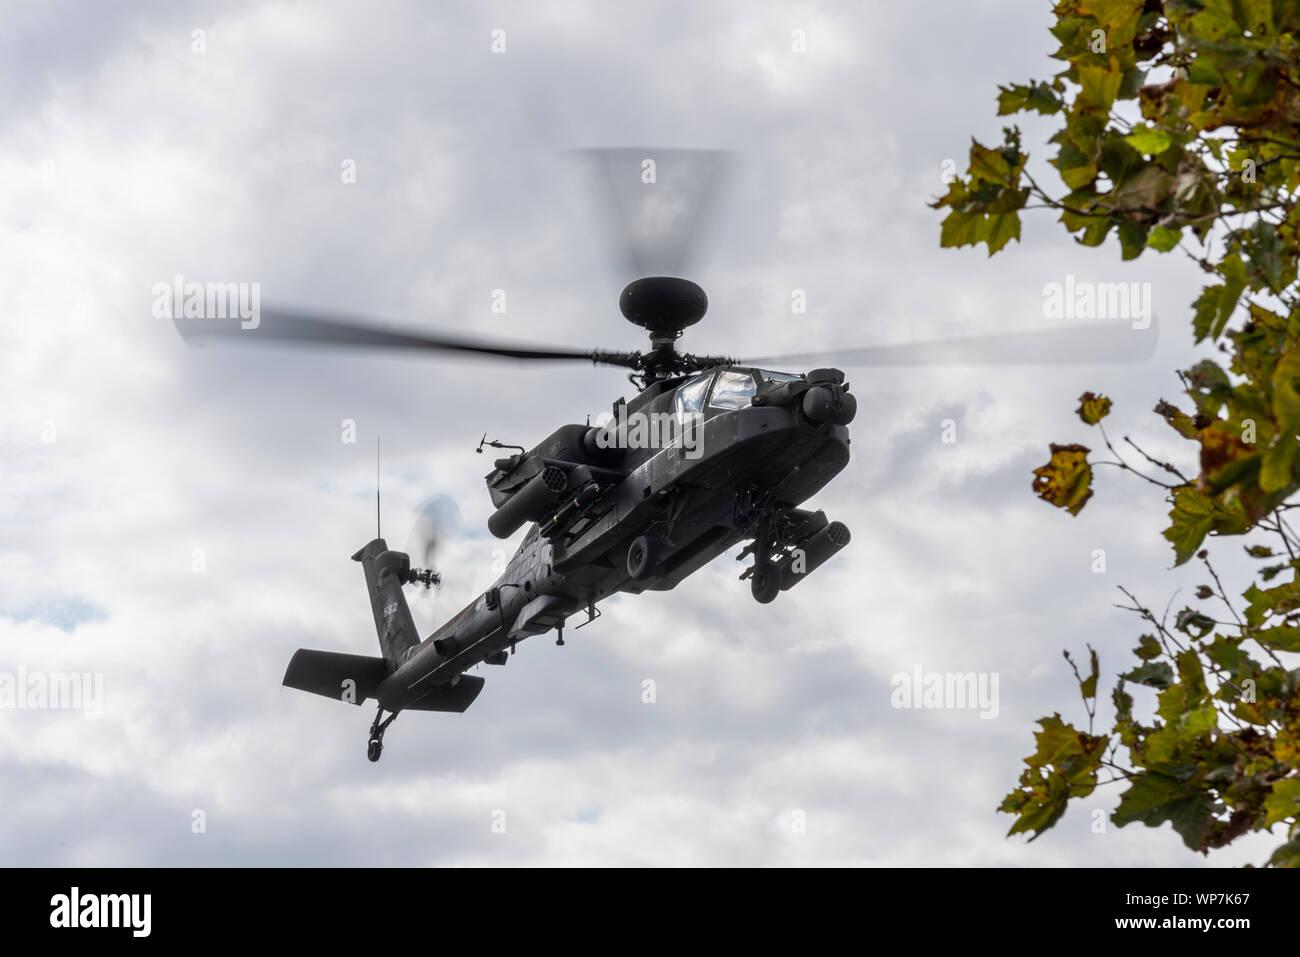 US Army AH-64 Apache gunship landing at Defence & Security Equipment International DSEI arms fair trade show, ExCel, London, UK Stock Photo